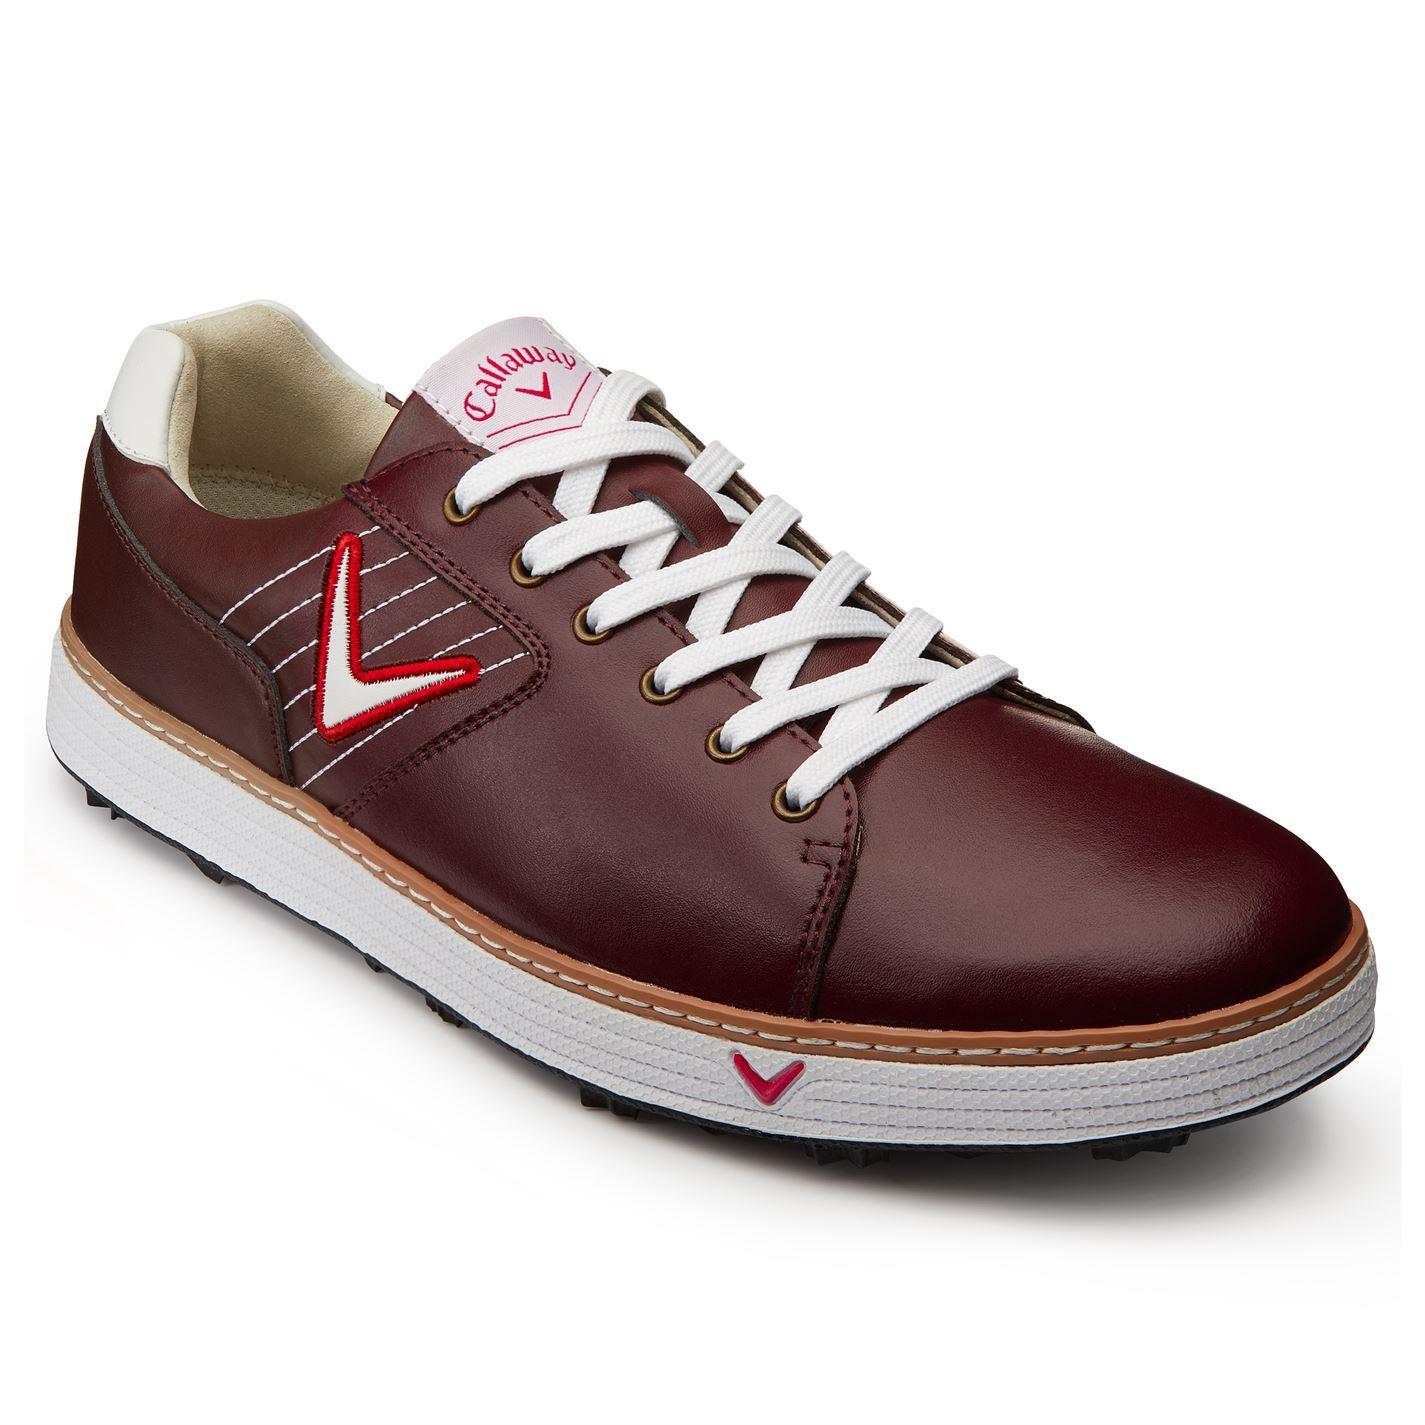 Callaway-Delmar-Urban-Golf-Shoes-Mens-Spikeless-Footwear thumbnail 9